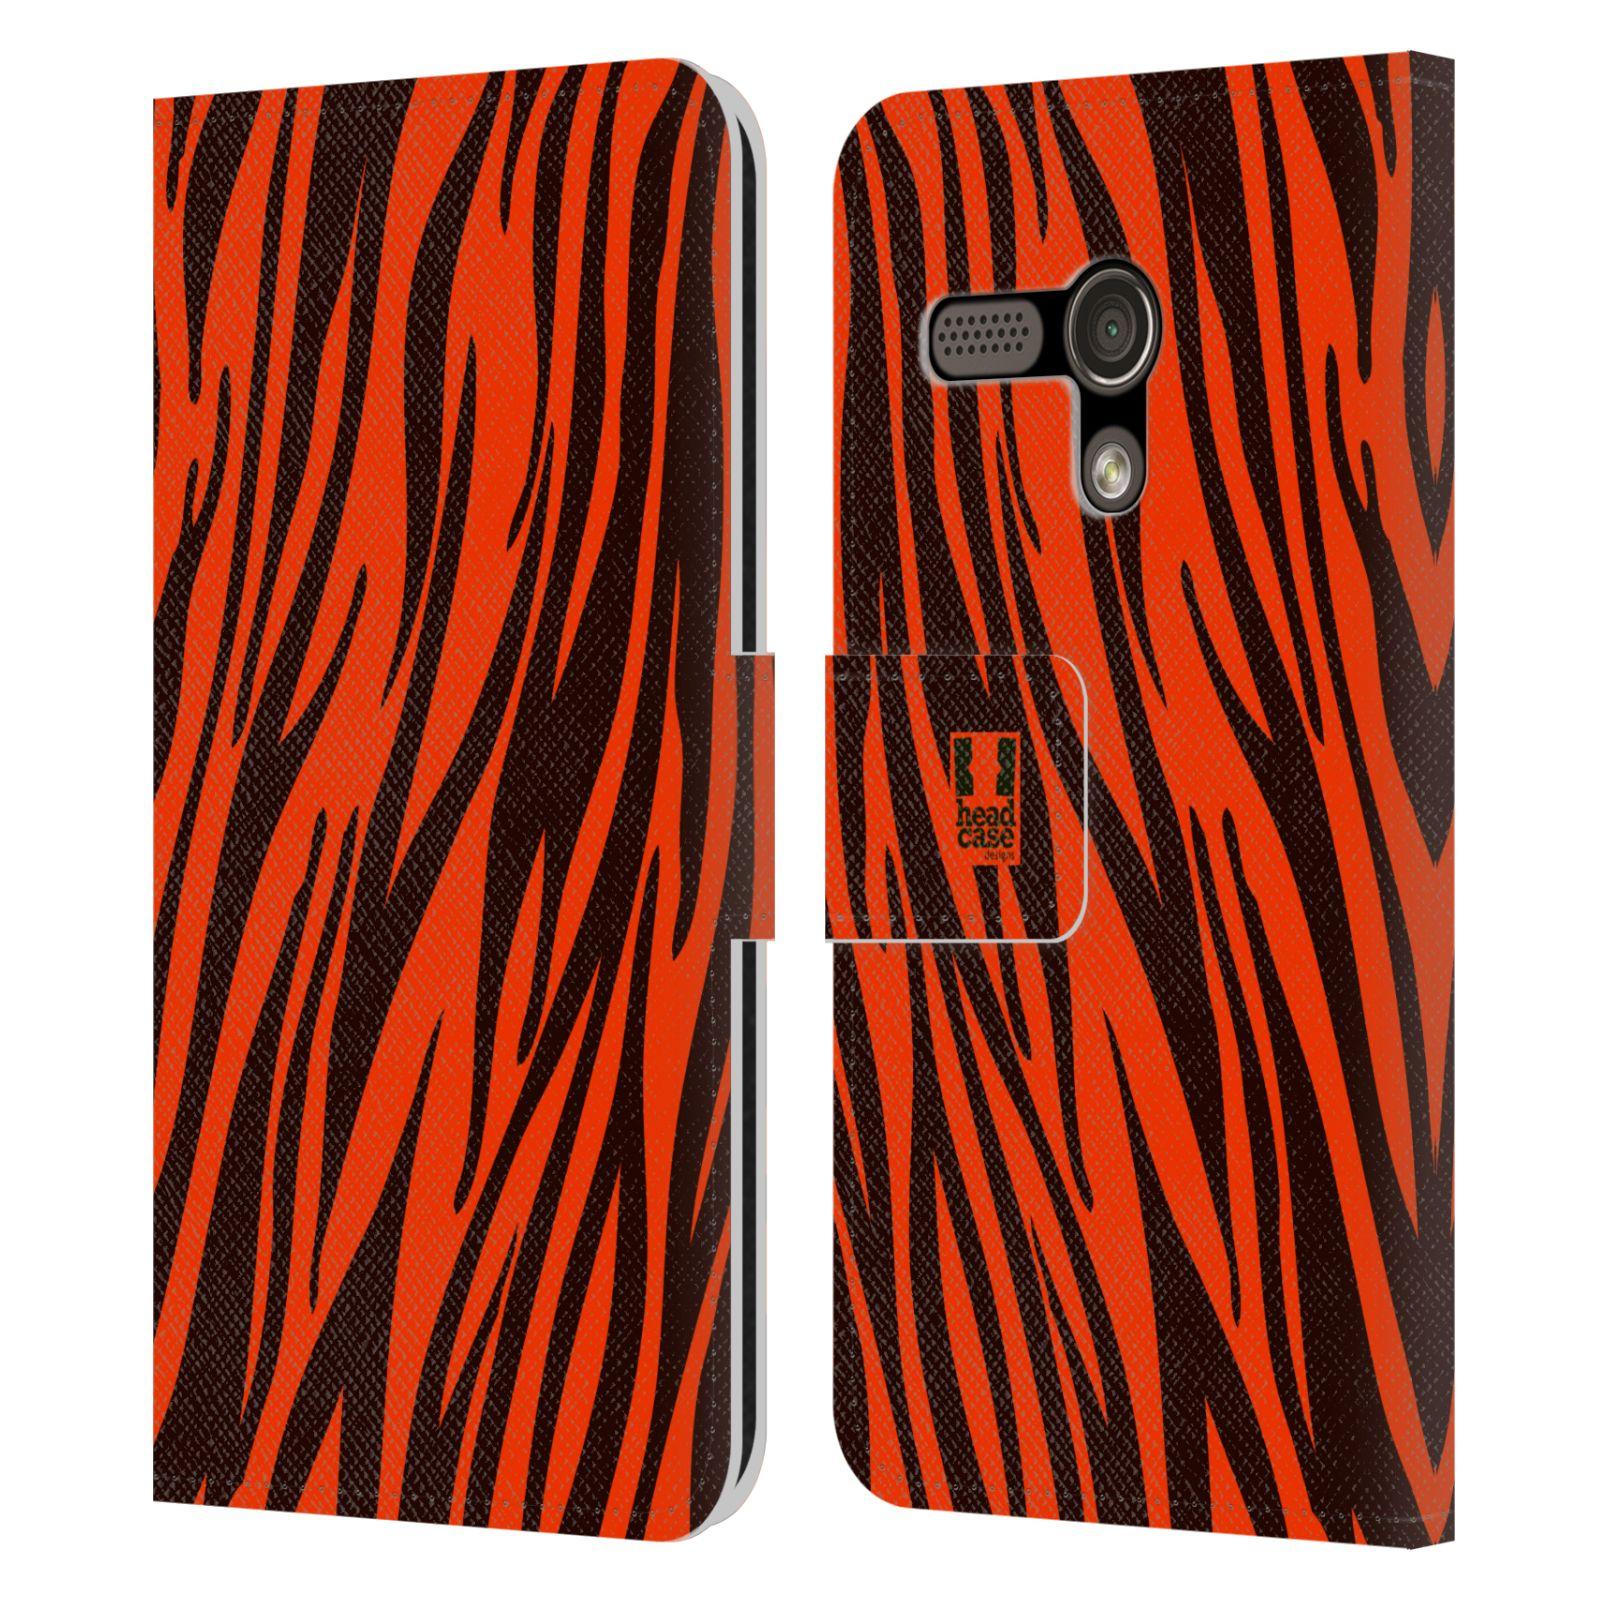 HEAD CASE Flipové pouzdro pro mobil MOTOROLA MOTO G Zvířecí barevné vzory oranžový tygr